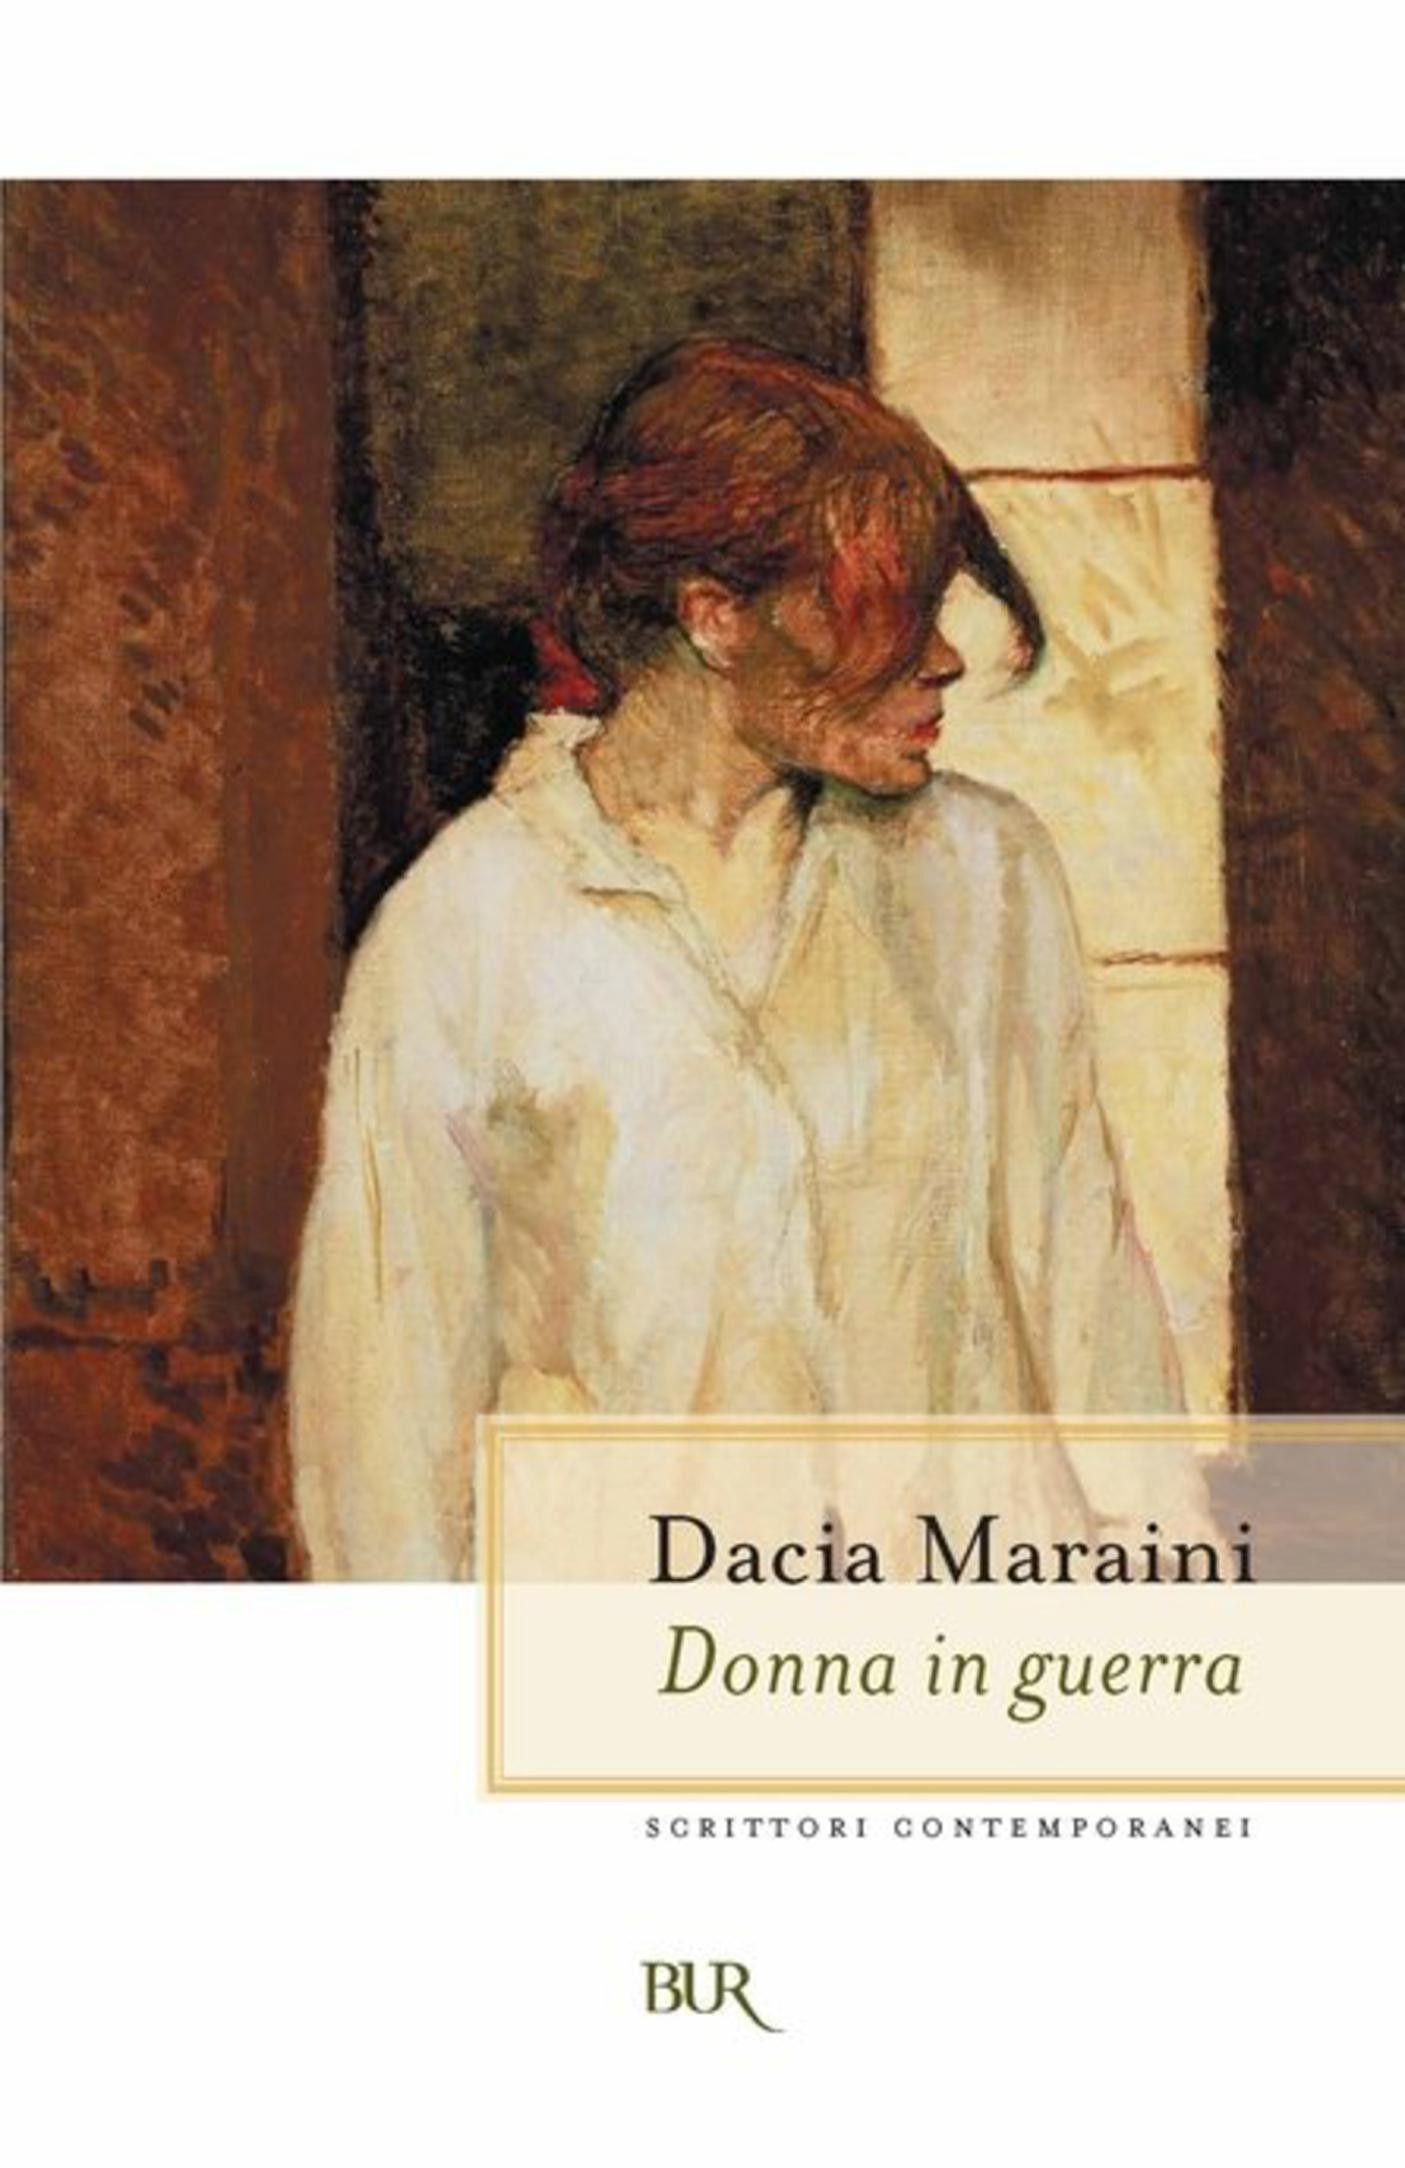 dacia maraini, donna in guerra